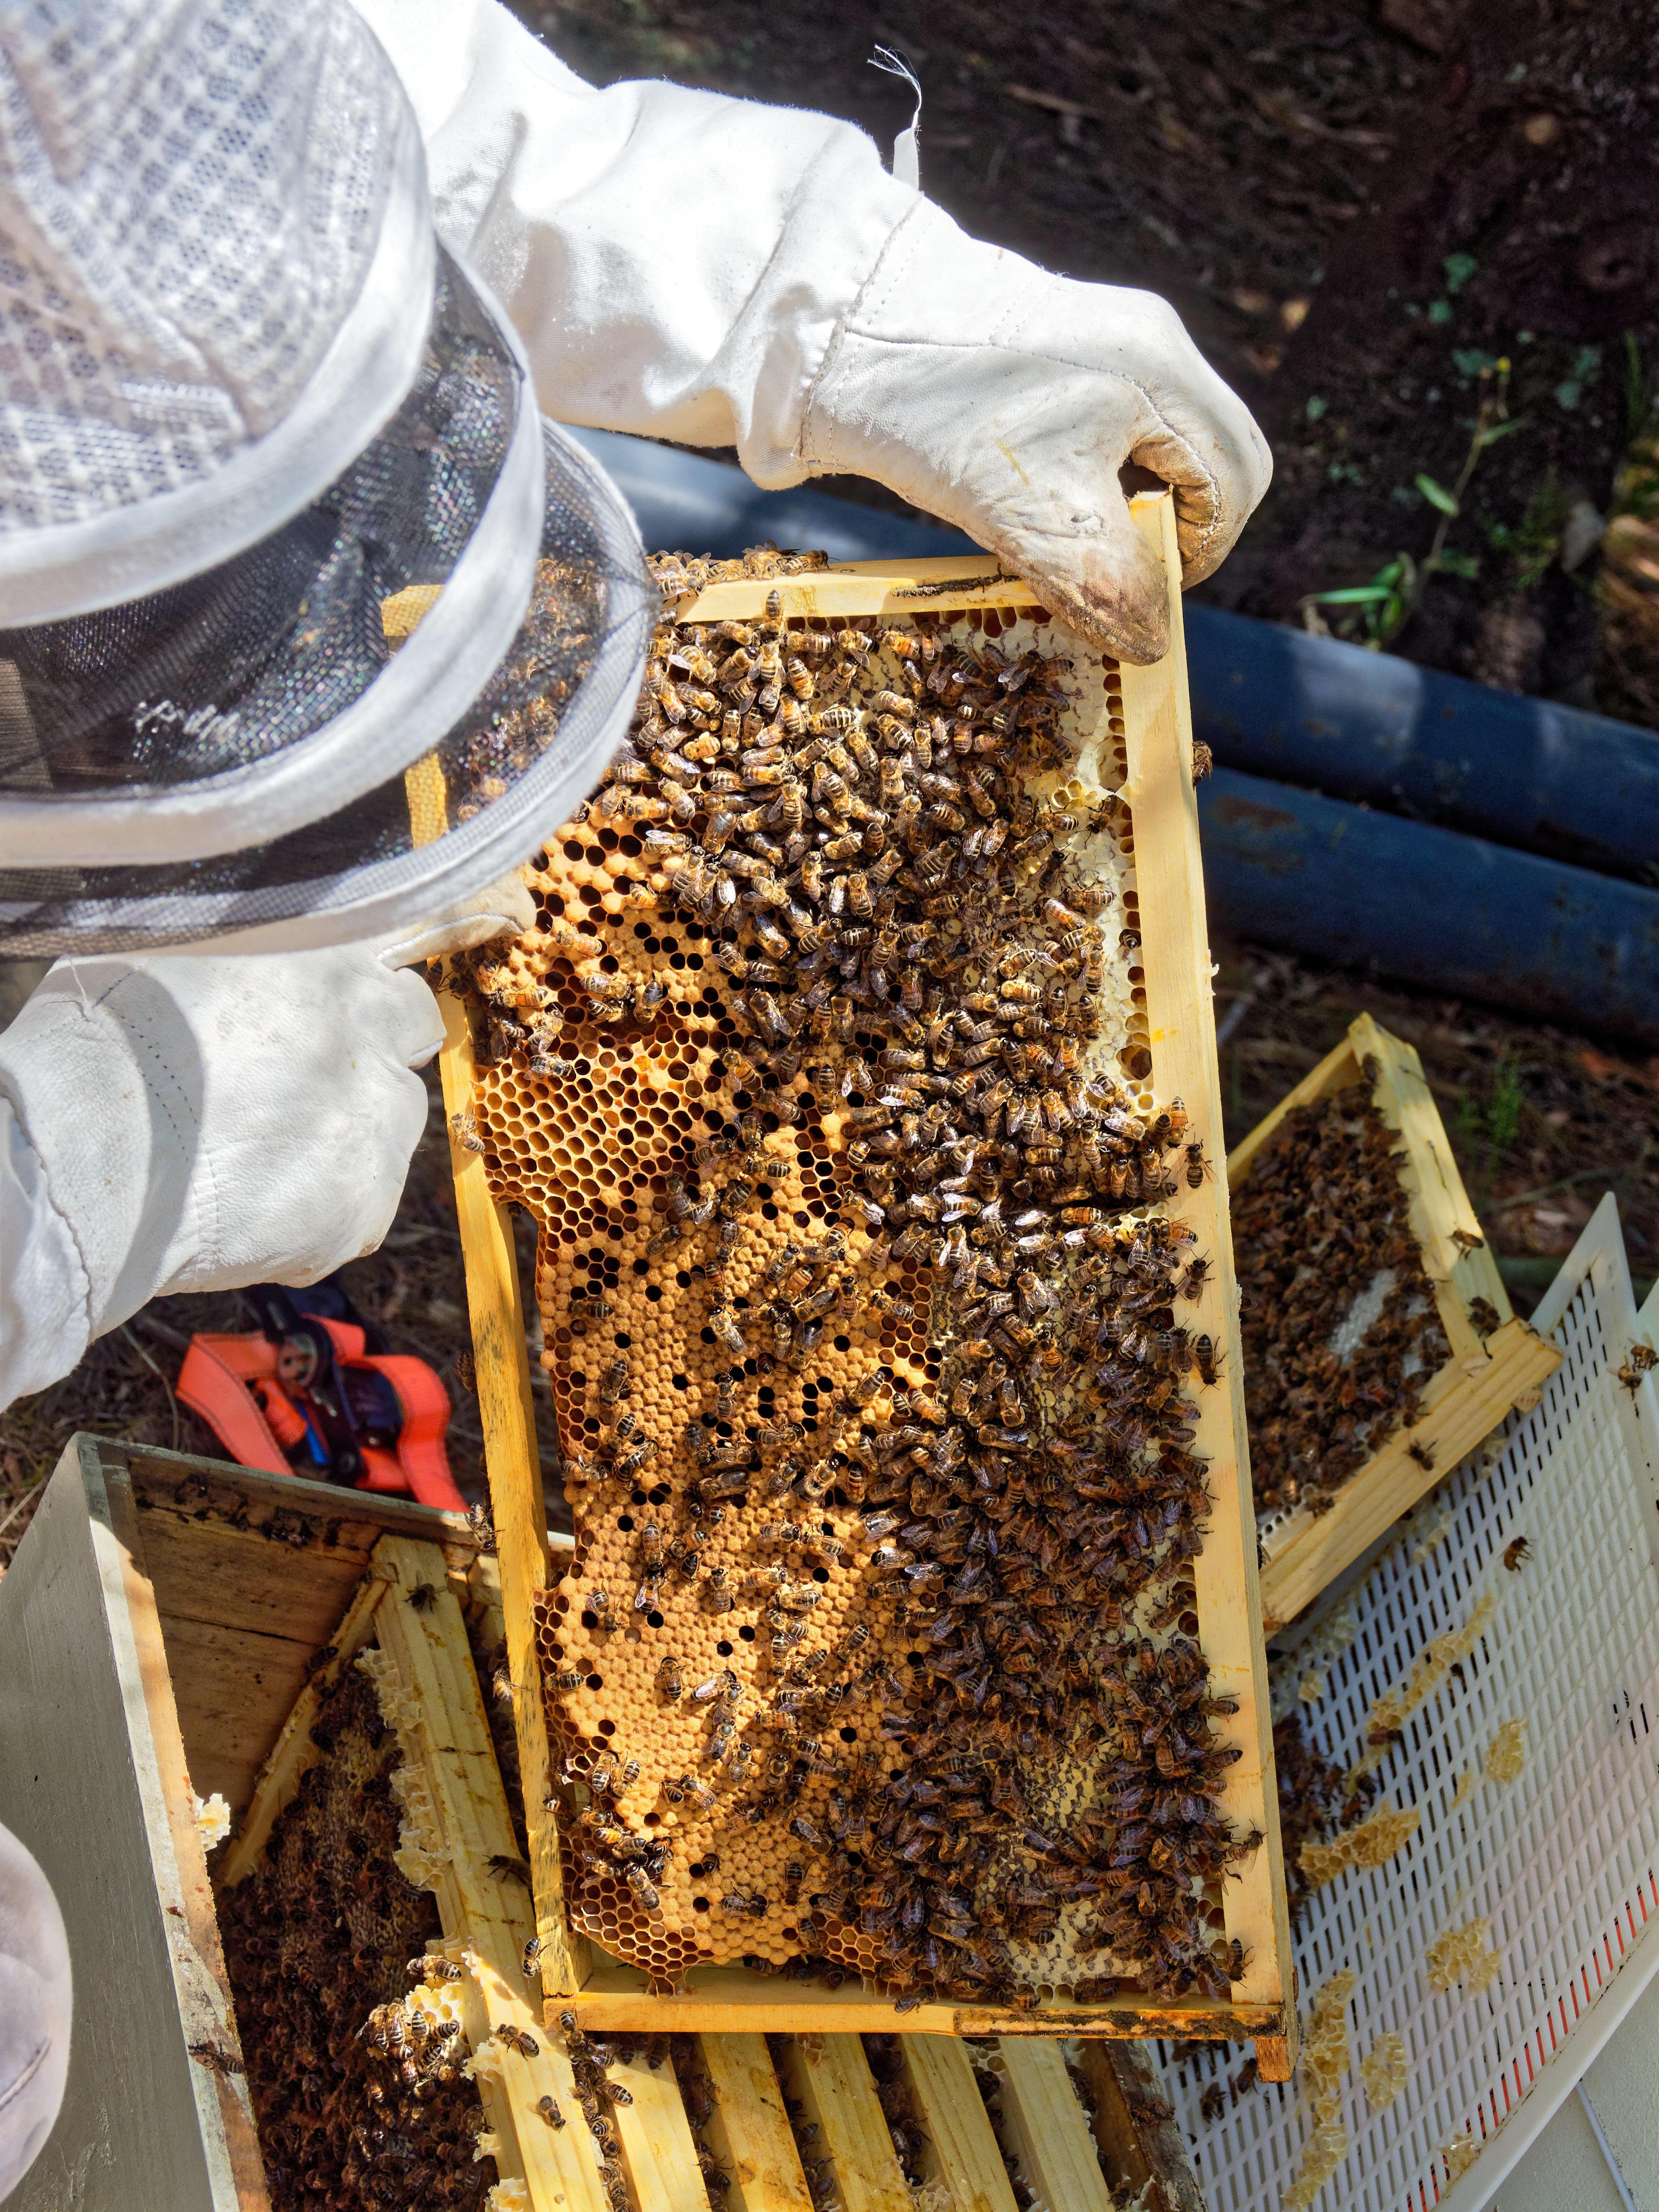 Inspecting-beehives-49.jpeg